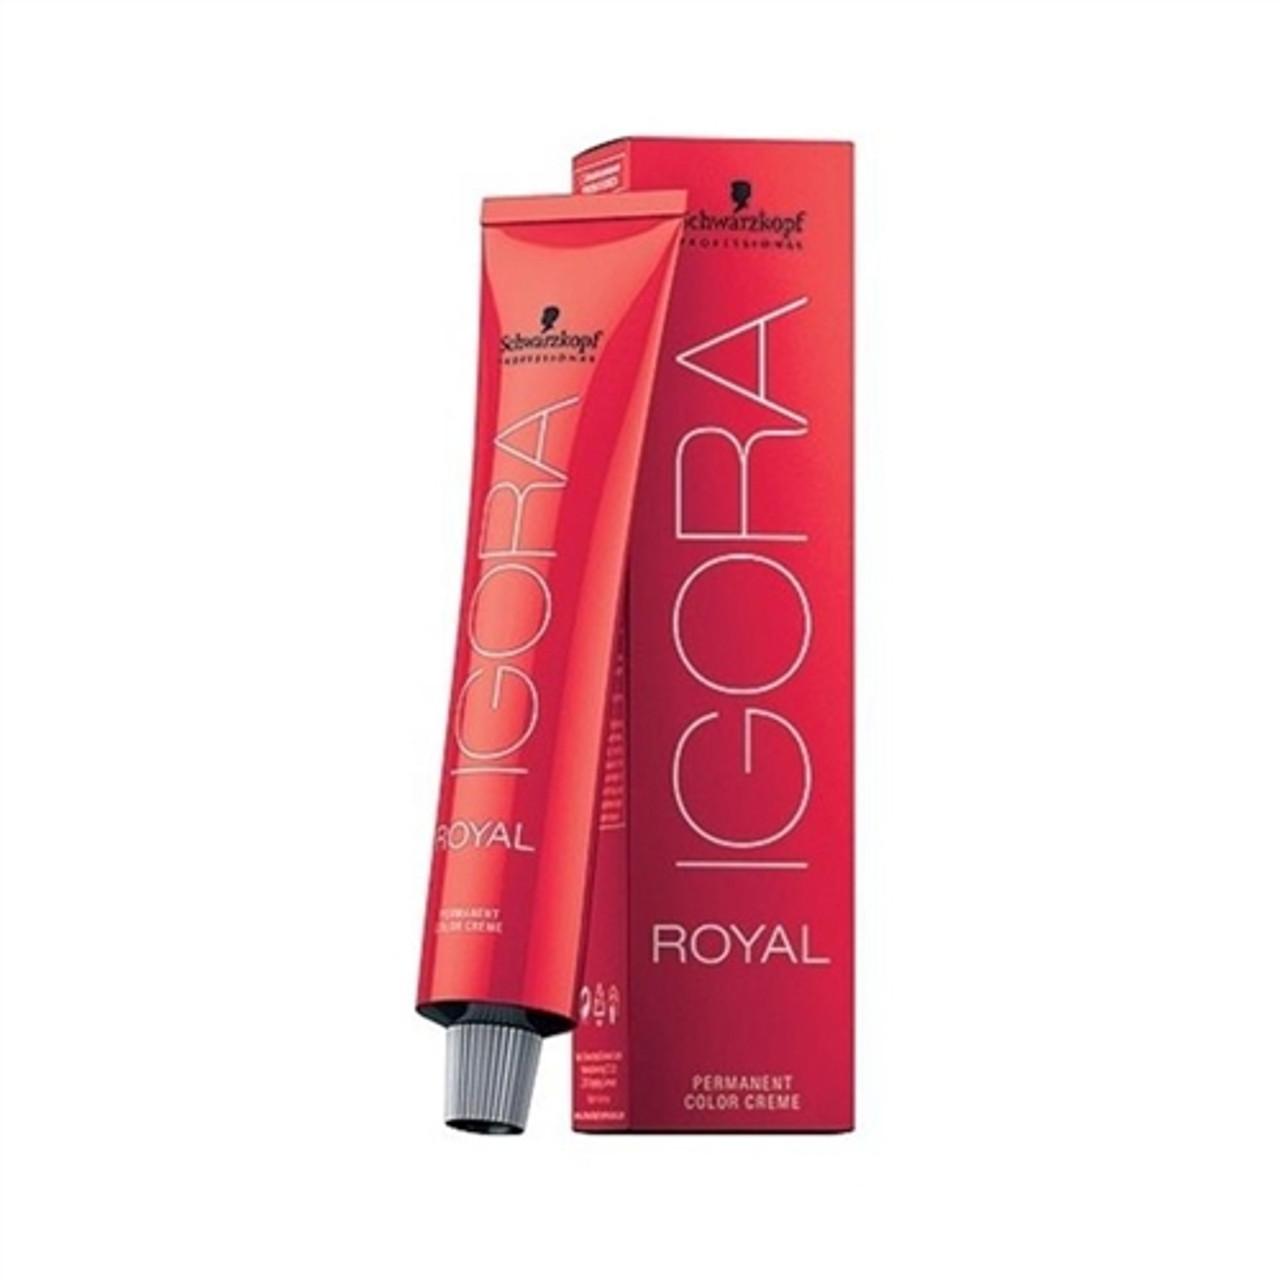 6-00 Dark blondee Schwarzkopf Igora Royal Permanent Color Creme -  2.1 oz